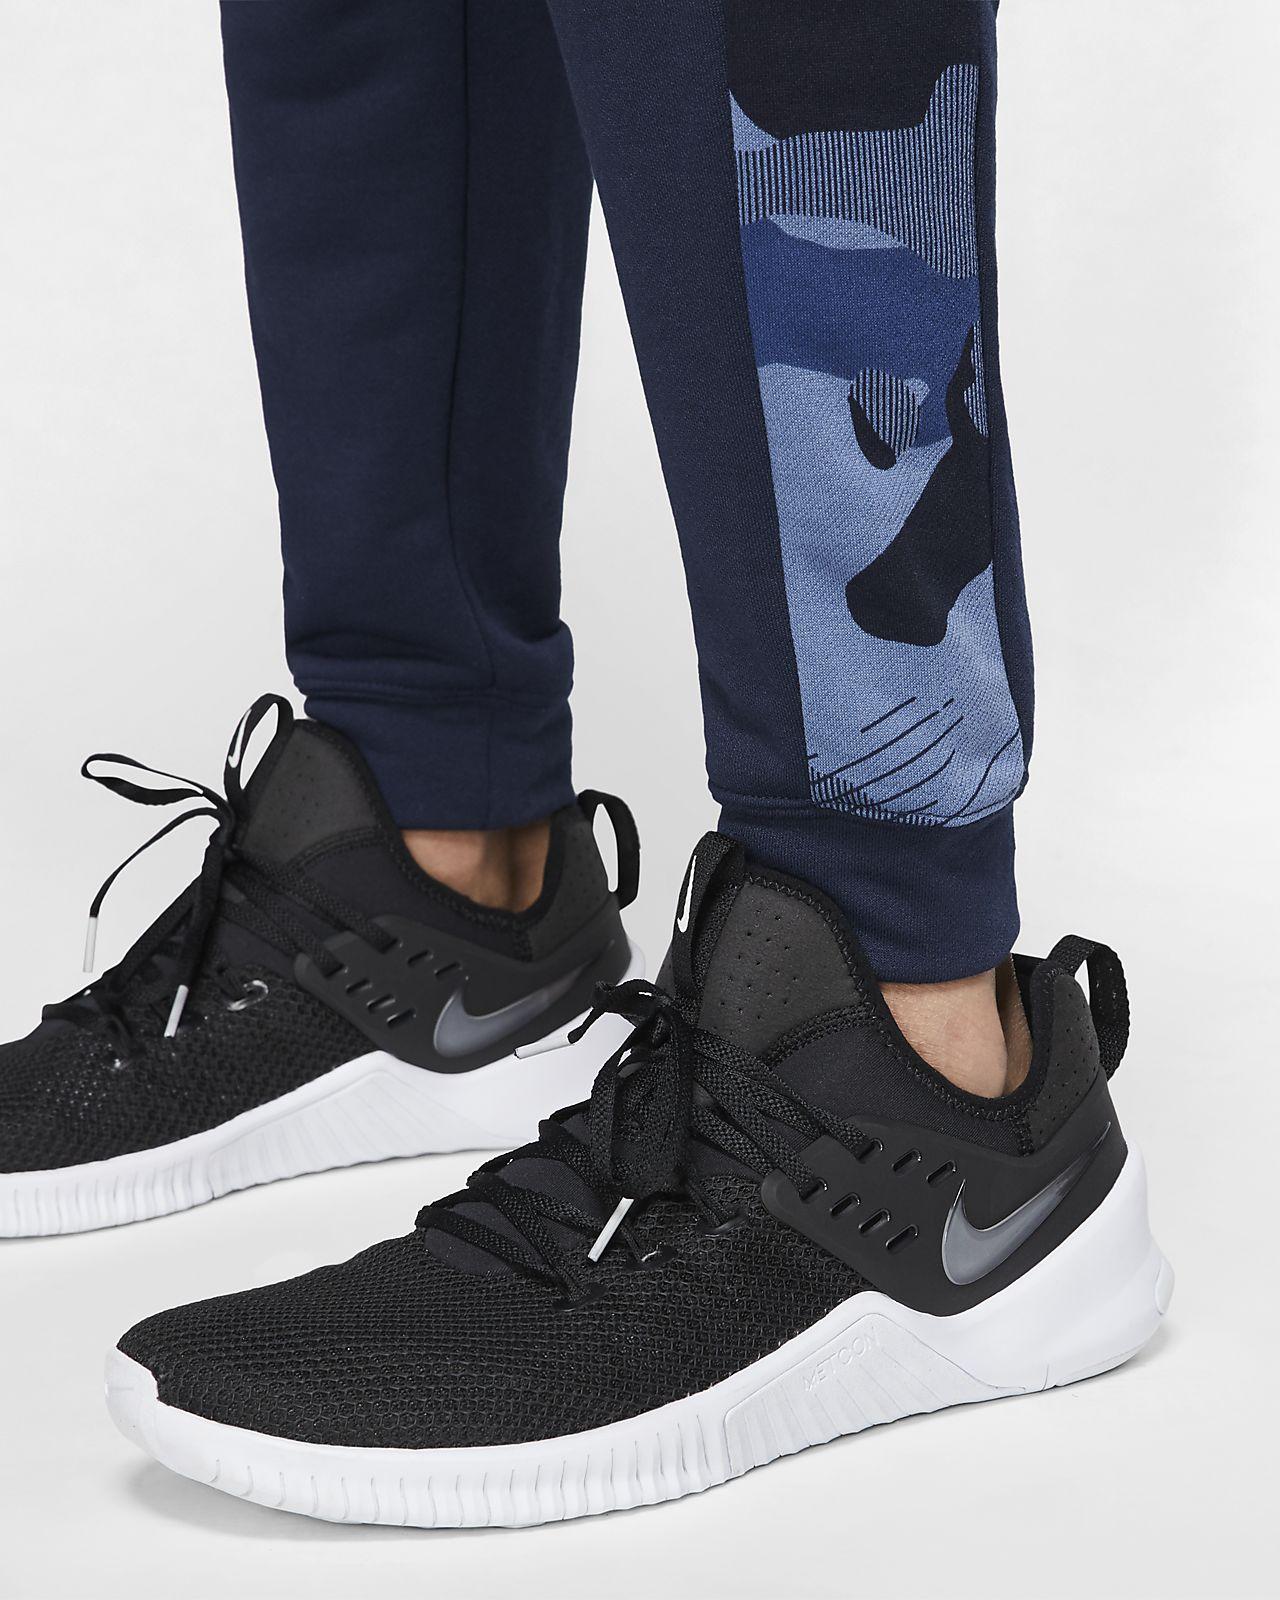 chic clásico comprar mejor auténtica venta caliente Nike Dri-FIT Men's Tapered Fleece Training Pants. Nike.com